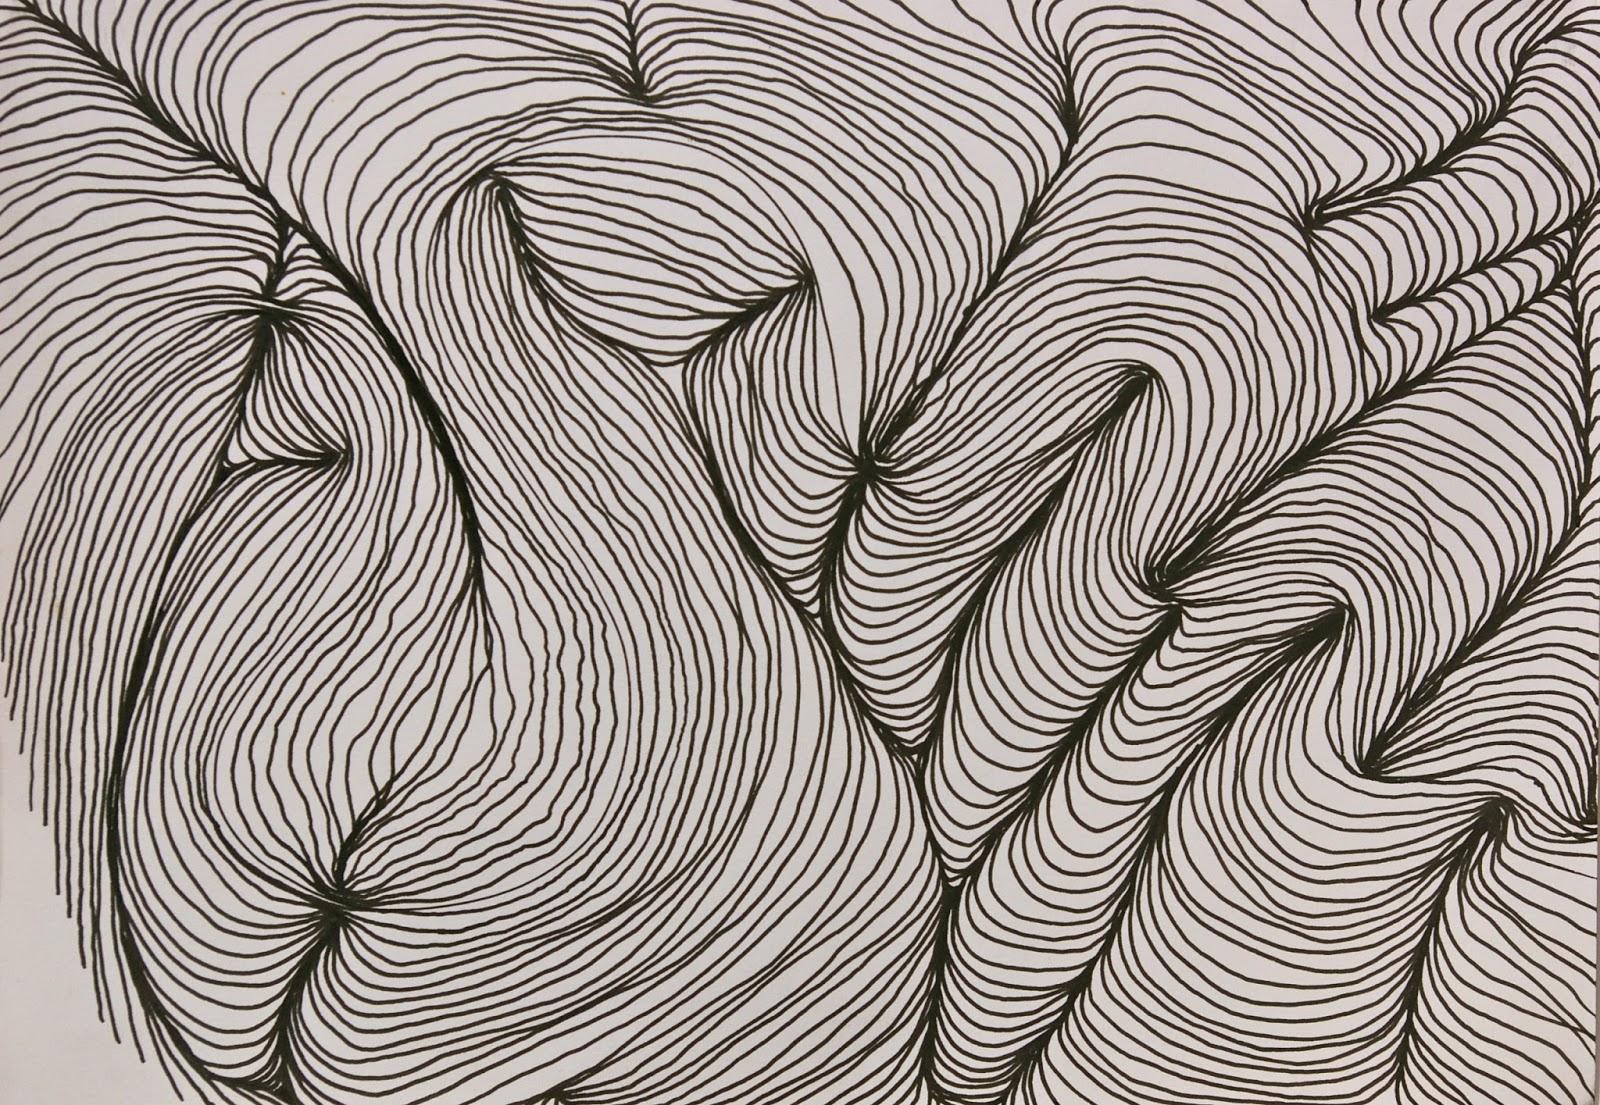 Curved Lines In Art : Aylish s oca learning log sketchbook daniel zeller and john franzen